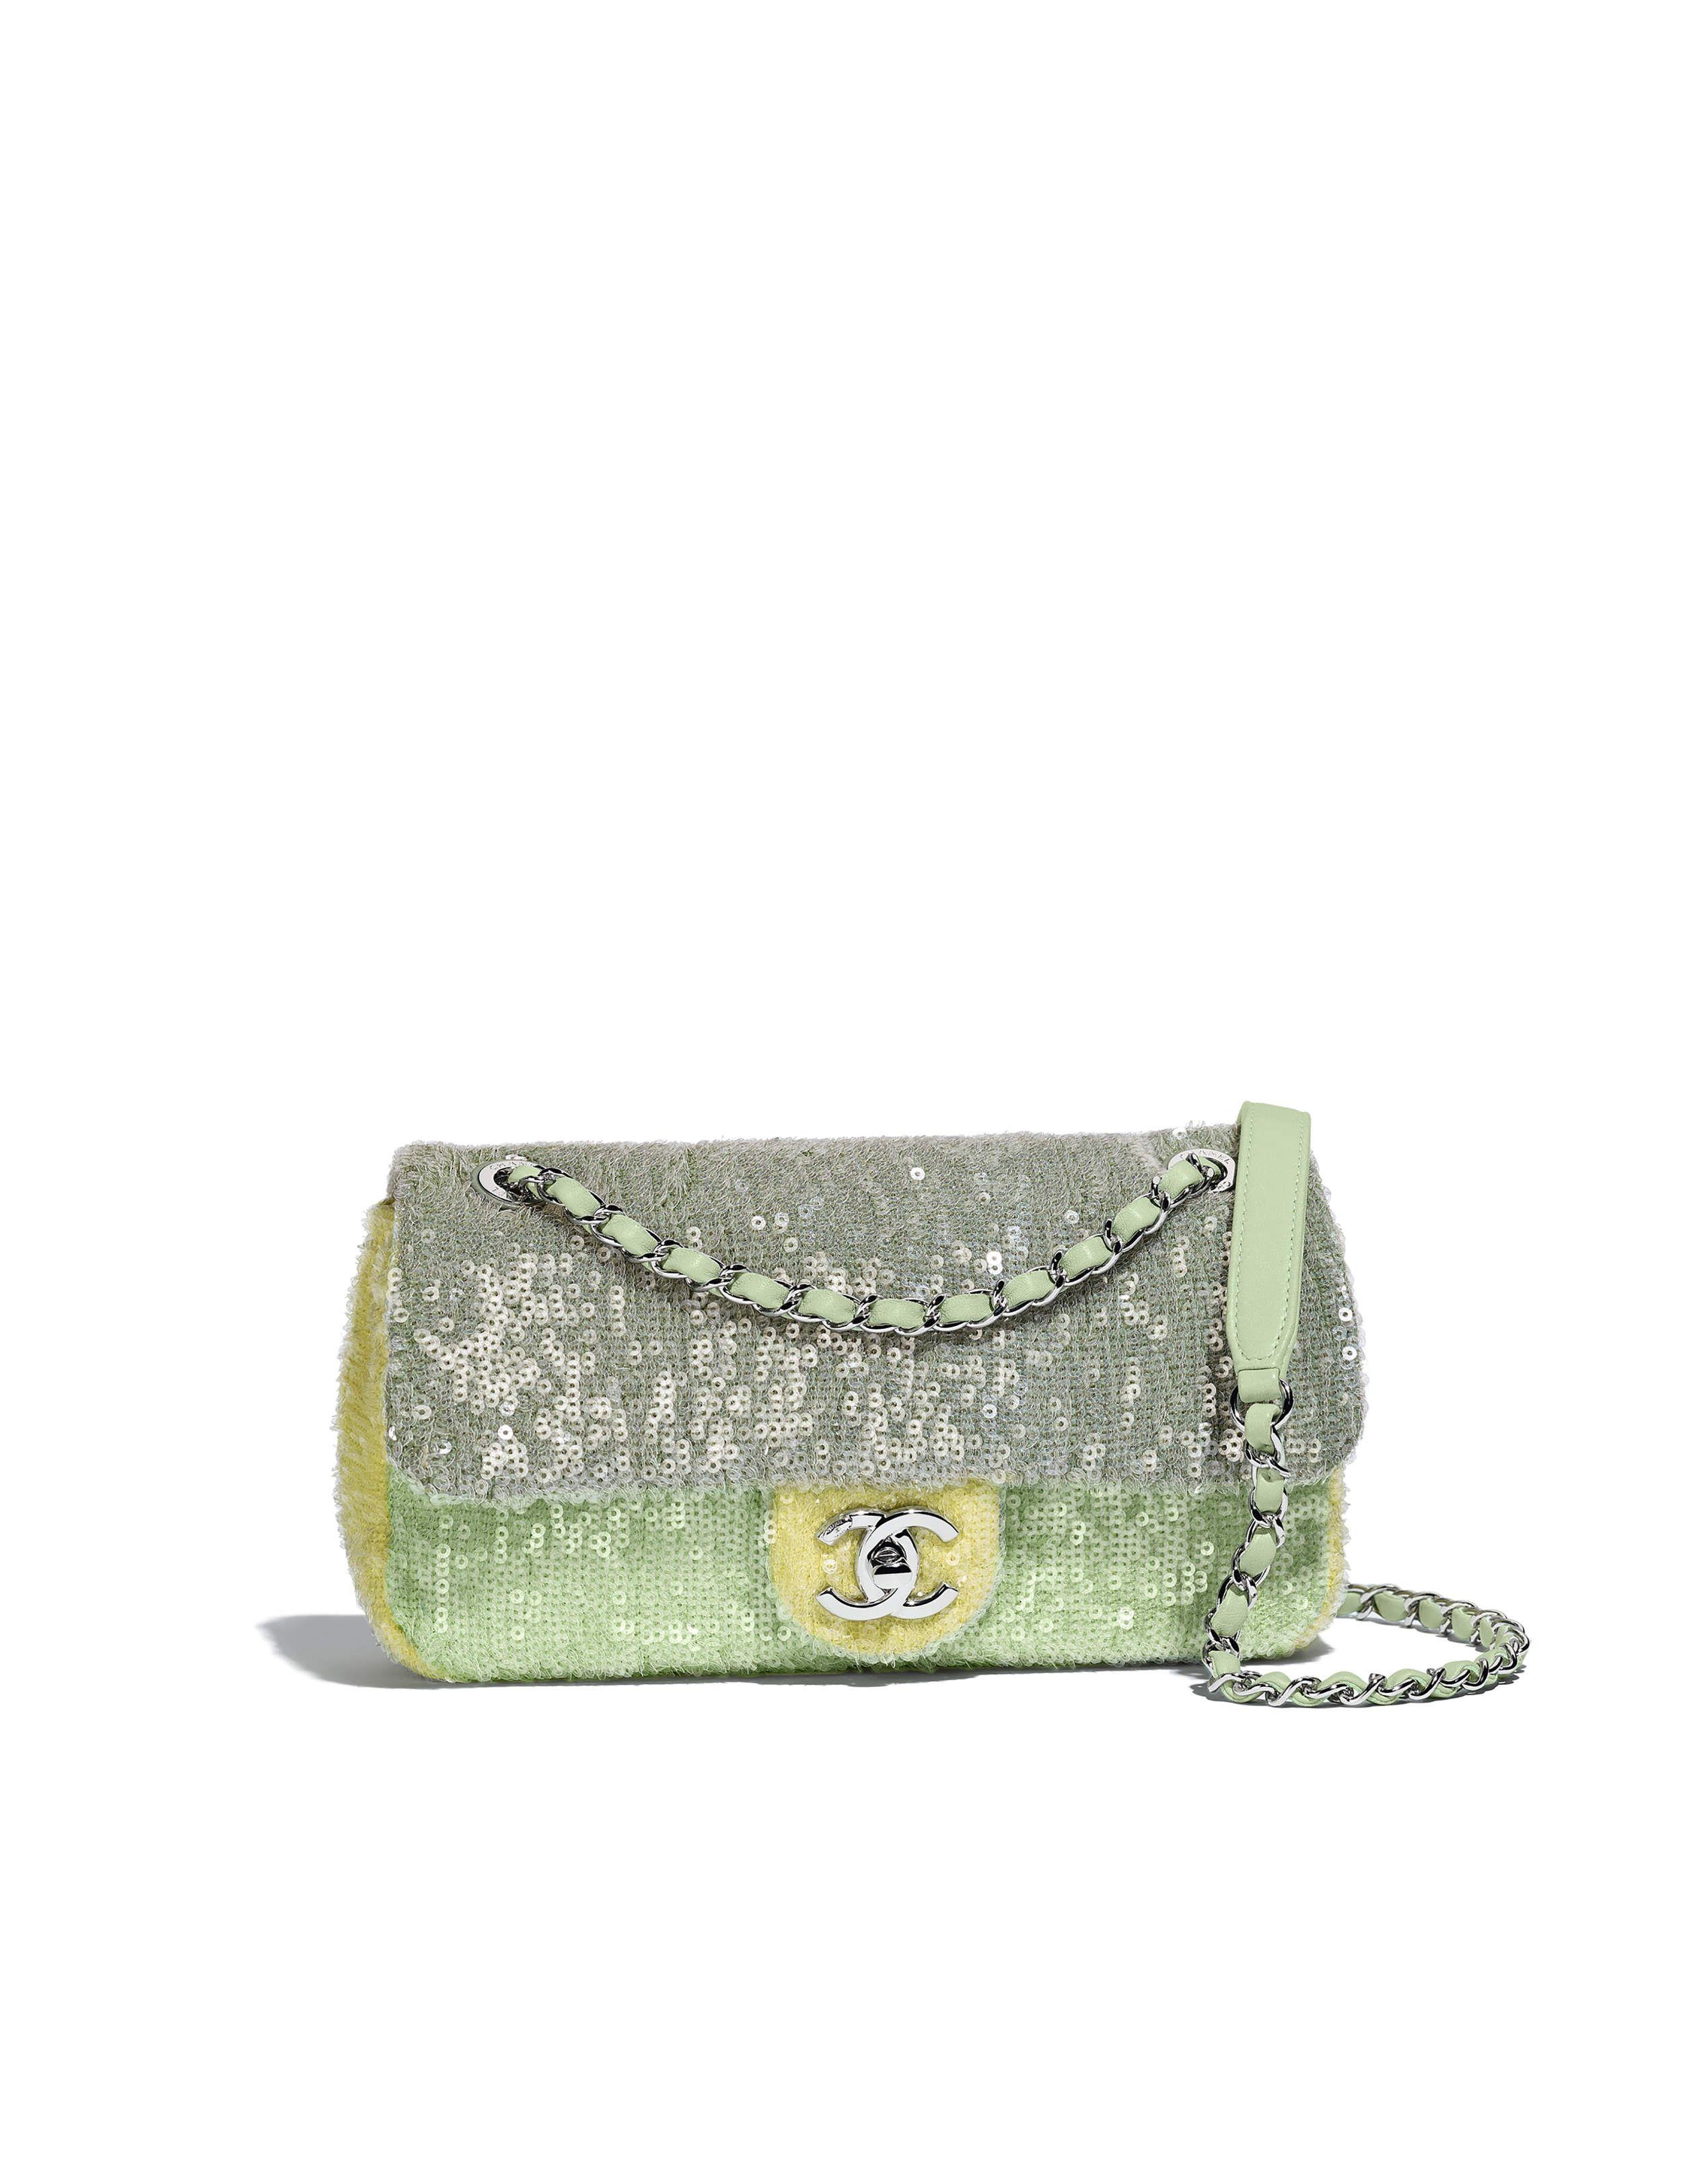 f6d9320c6aab Chanel - SS2018 | Green, light green & yellow sequin flap bag | BAGS ...